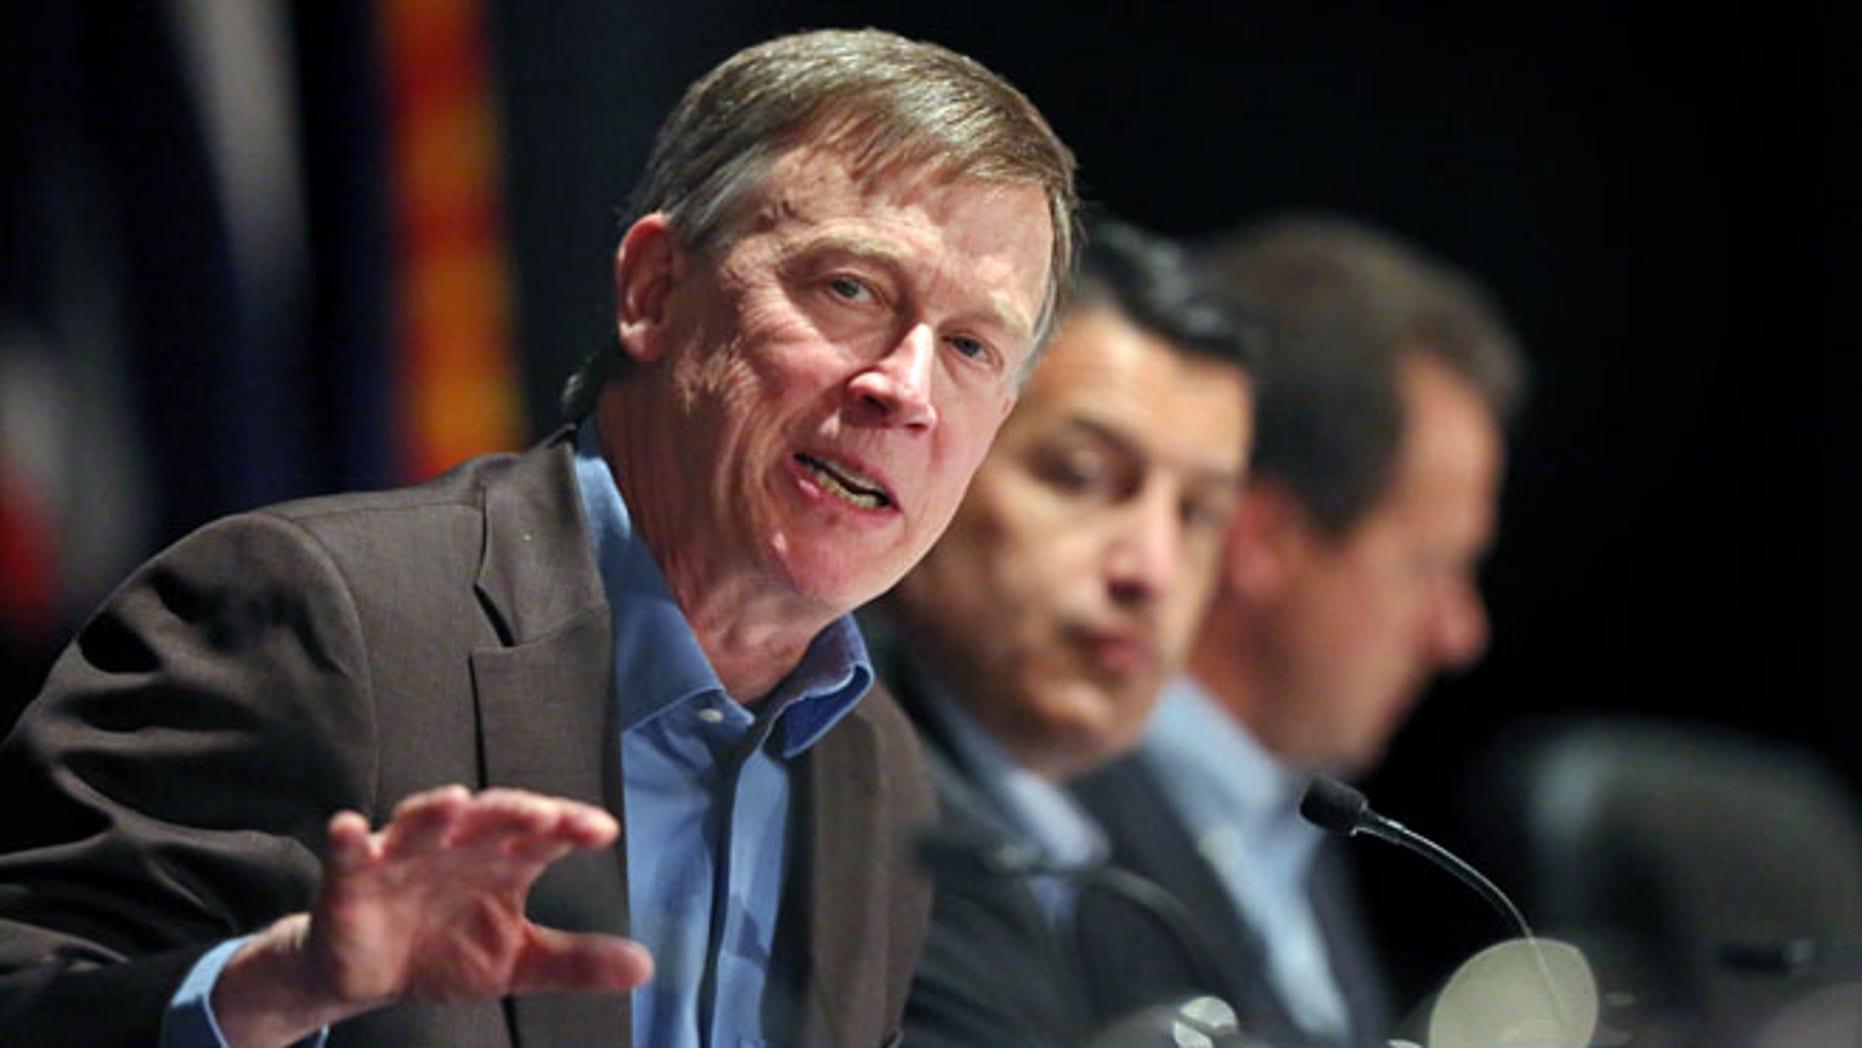 Colo. Governor John Hickenlooper at the Broadmoor Hotel in Colorado Springs, Tuesday, June 10, 2014.